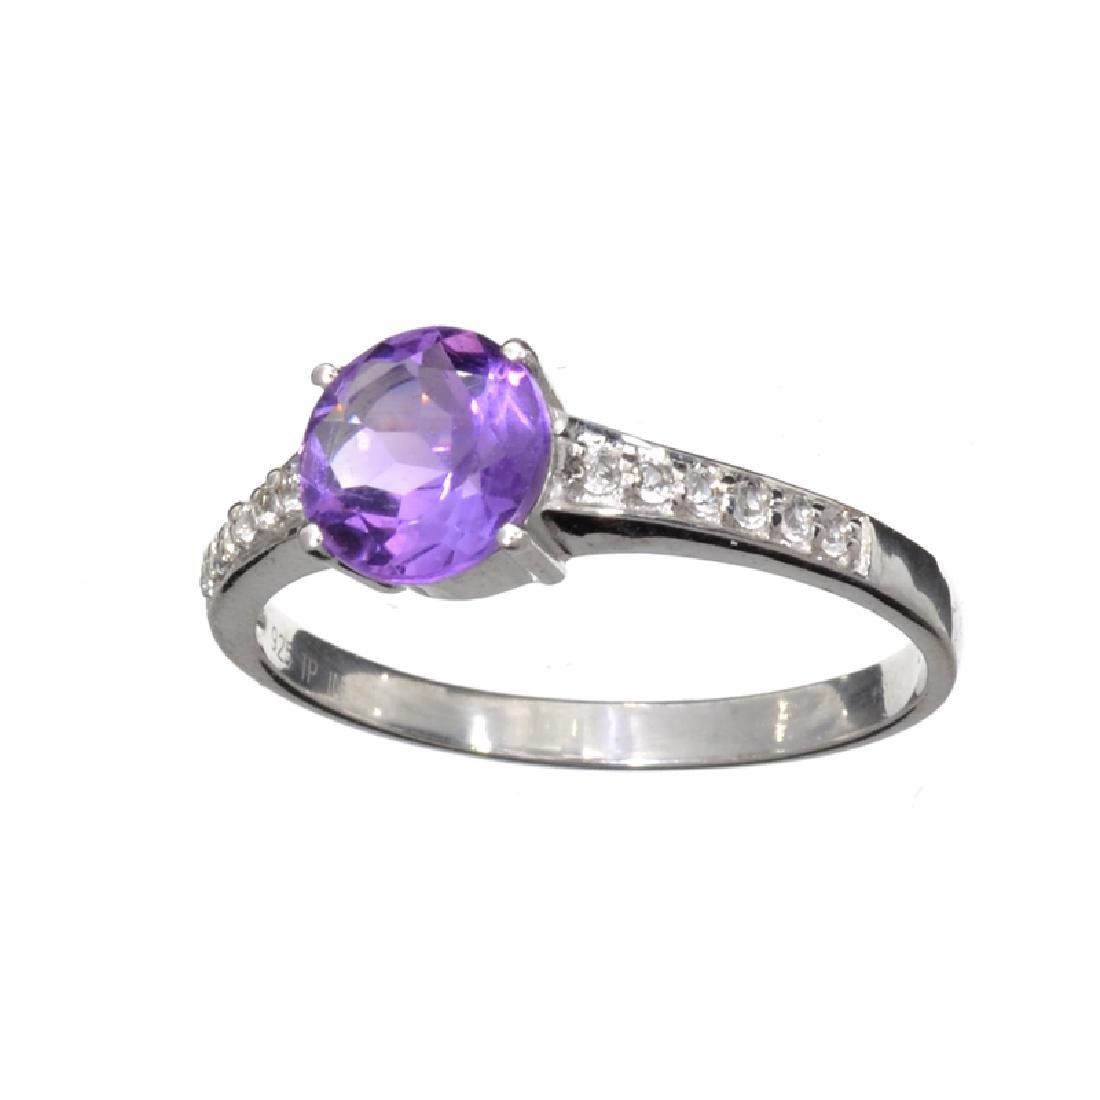 1.00CT Round Cut Purple Amethyst Quartz And Colorless